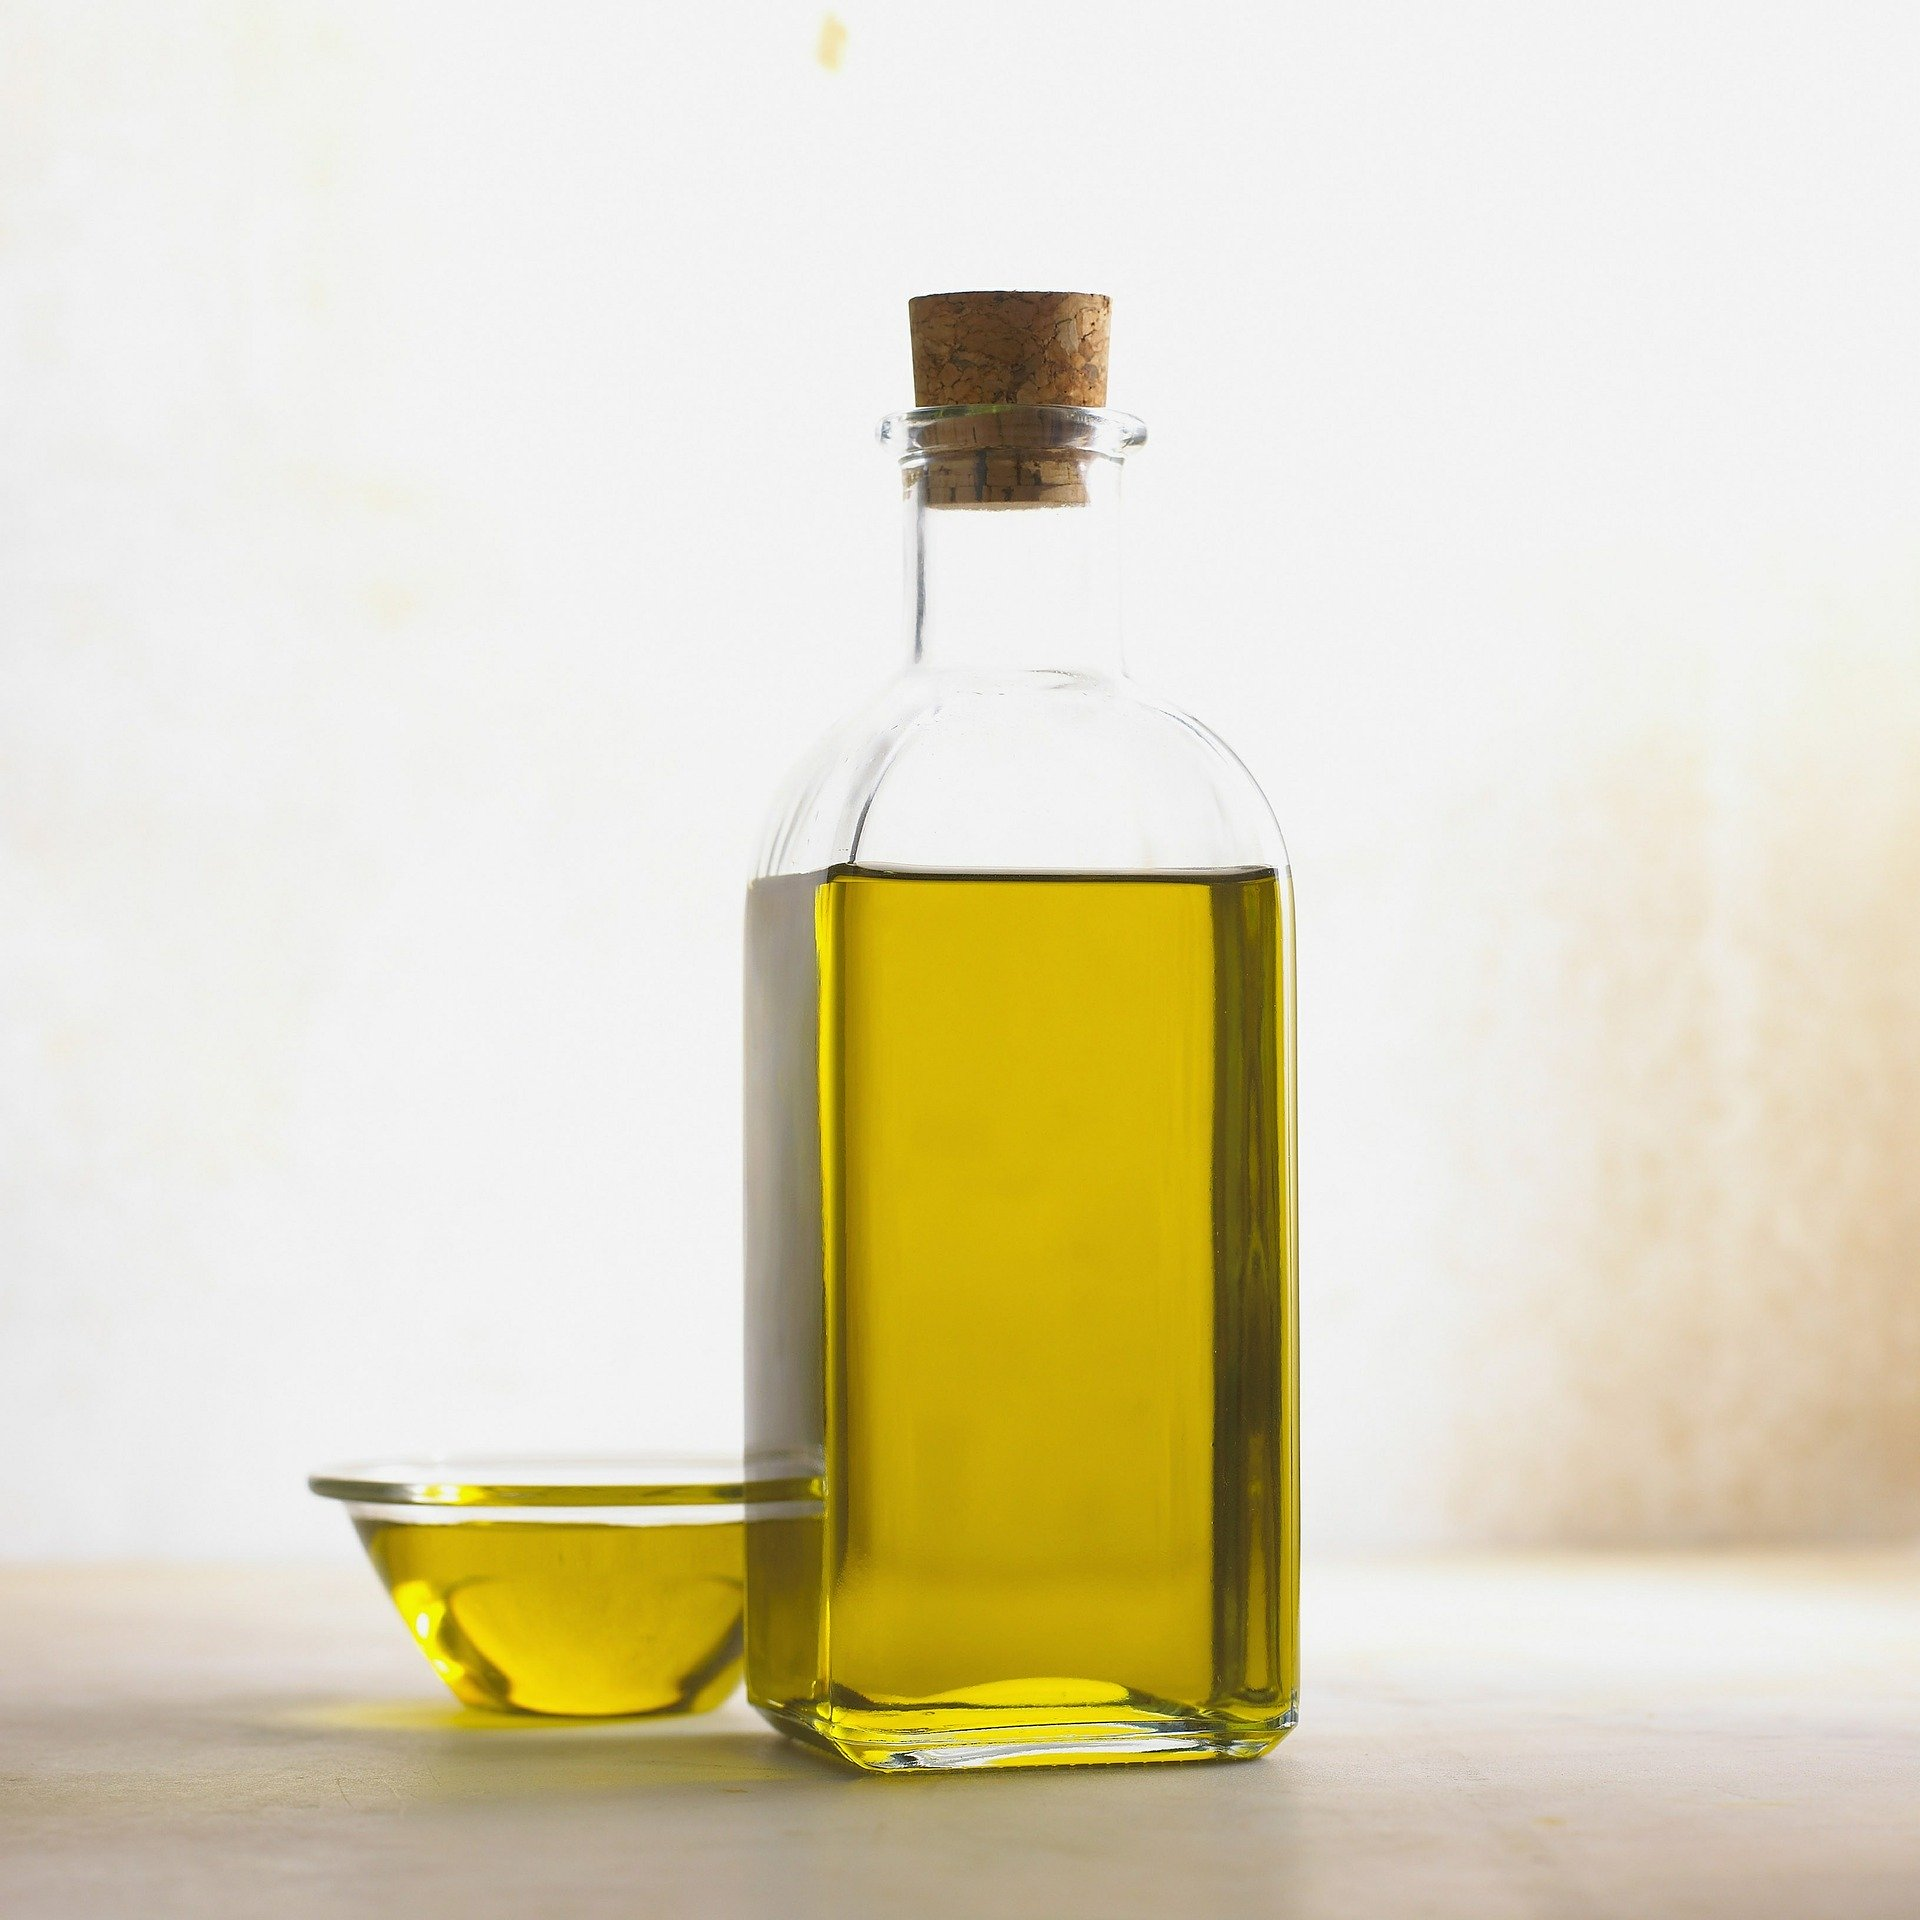 sesame oil benefits for hair in tamil